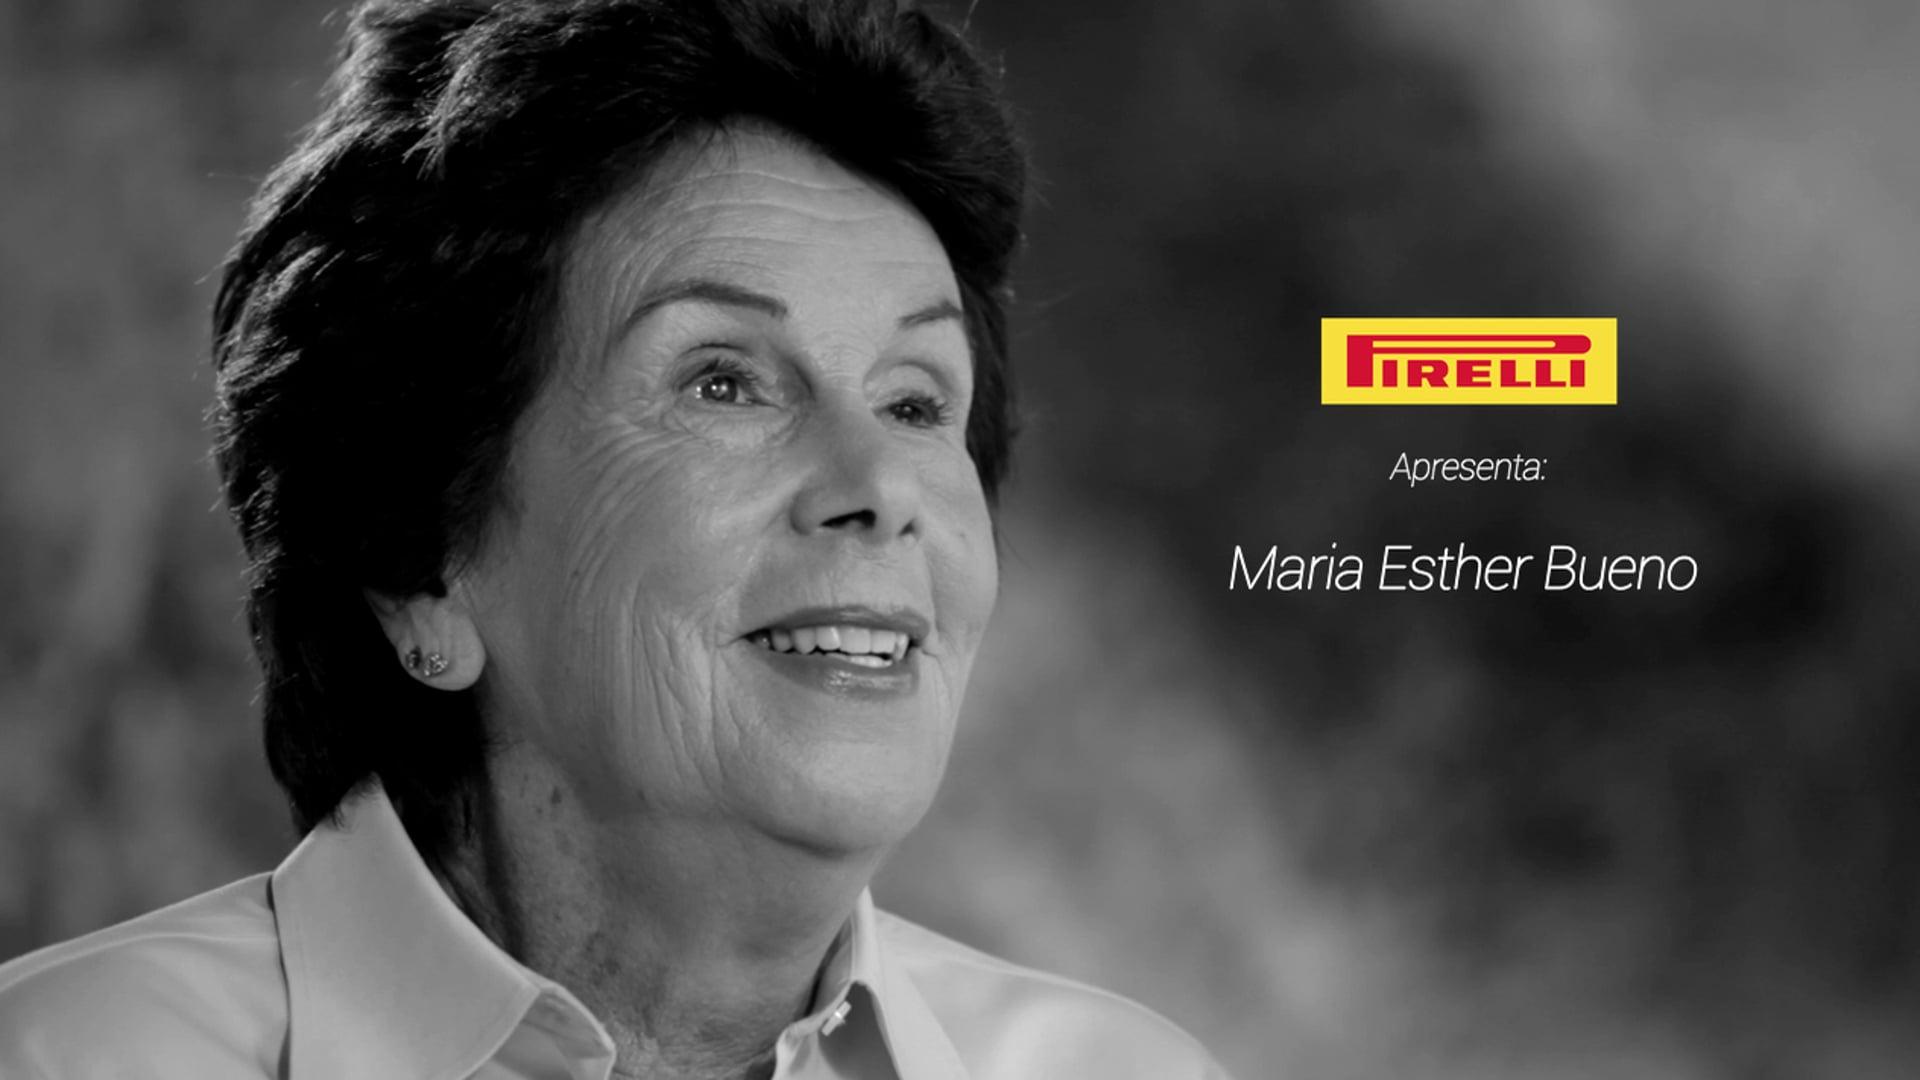 Pirelli / Maria Esther Bueno